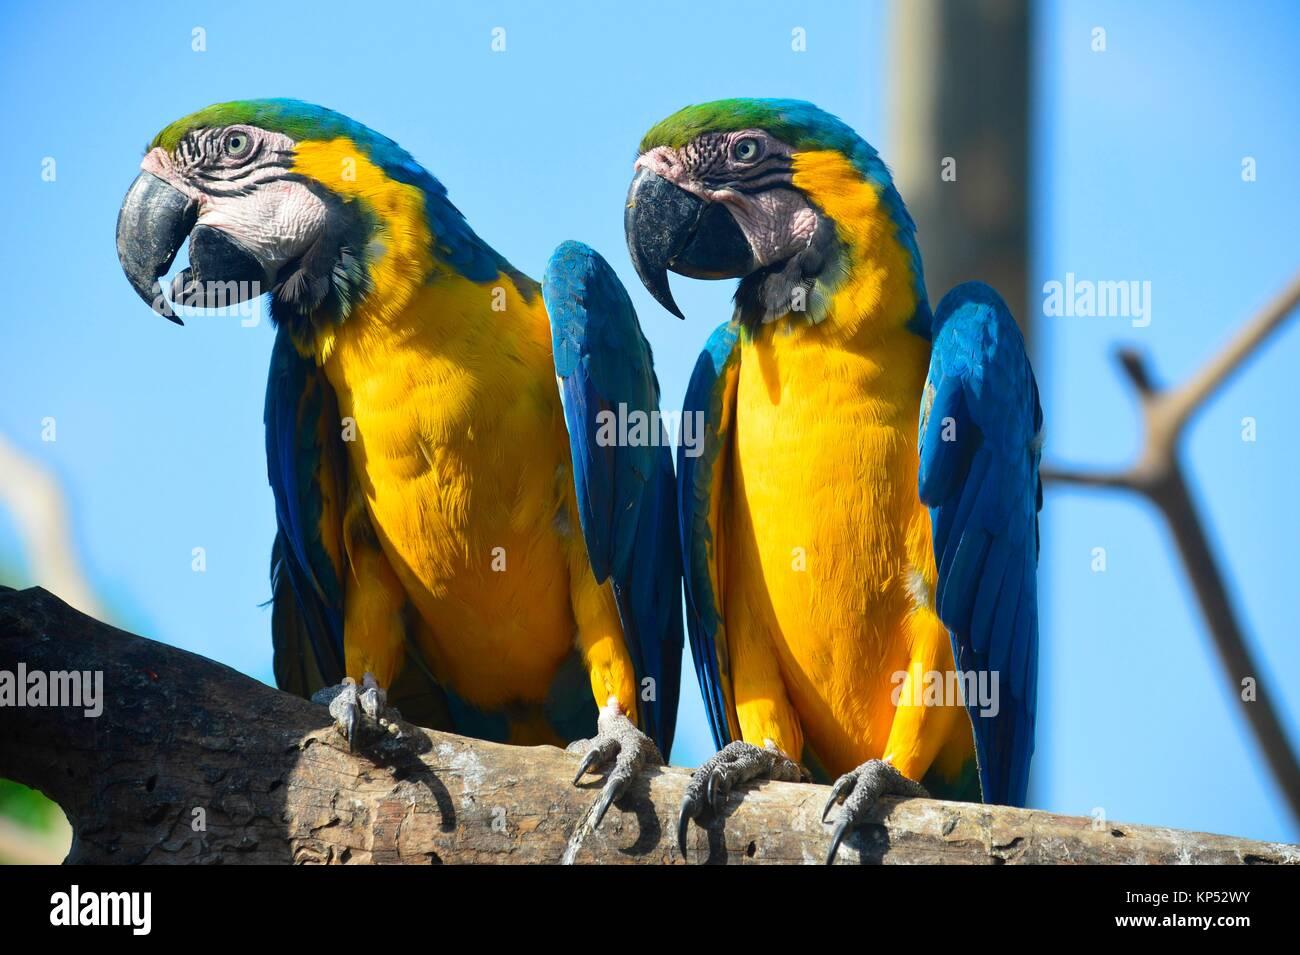 Papagei Ara, Aviario National de Colombia, Isla Baru, Kolumbien, Südamerika. Stockbild